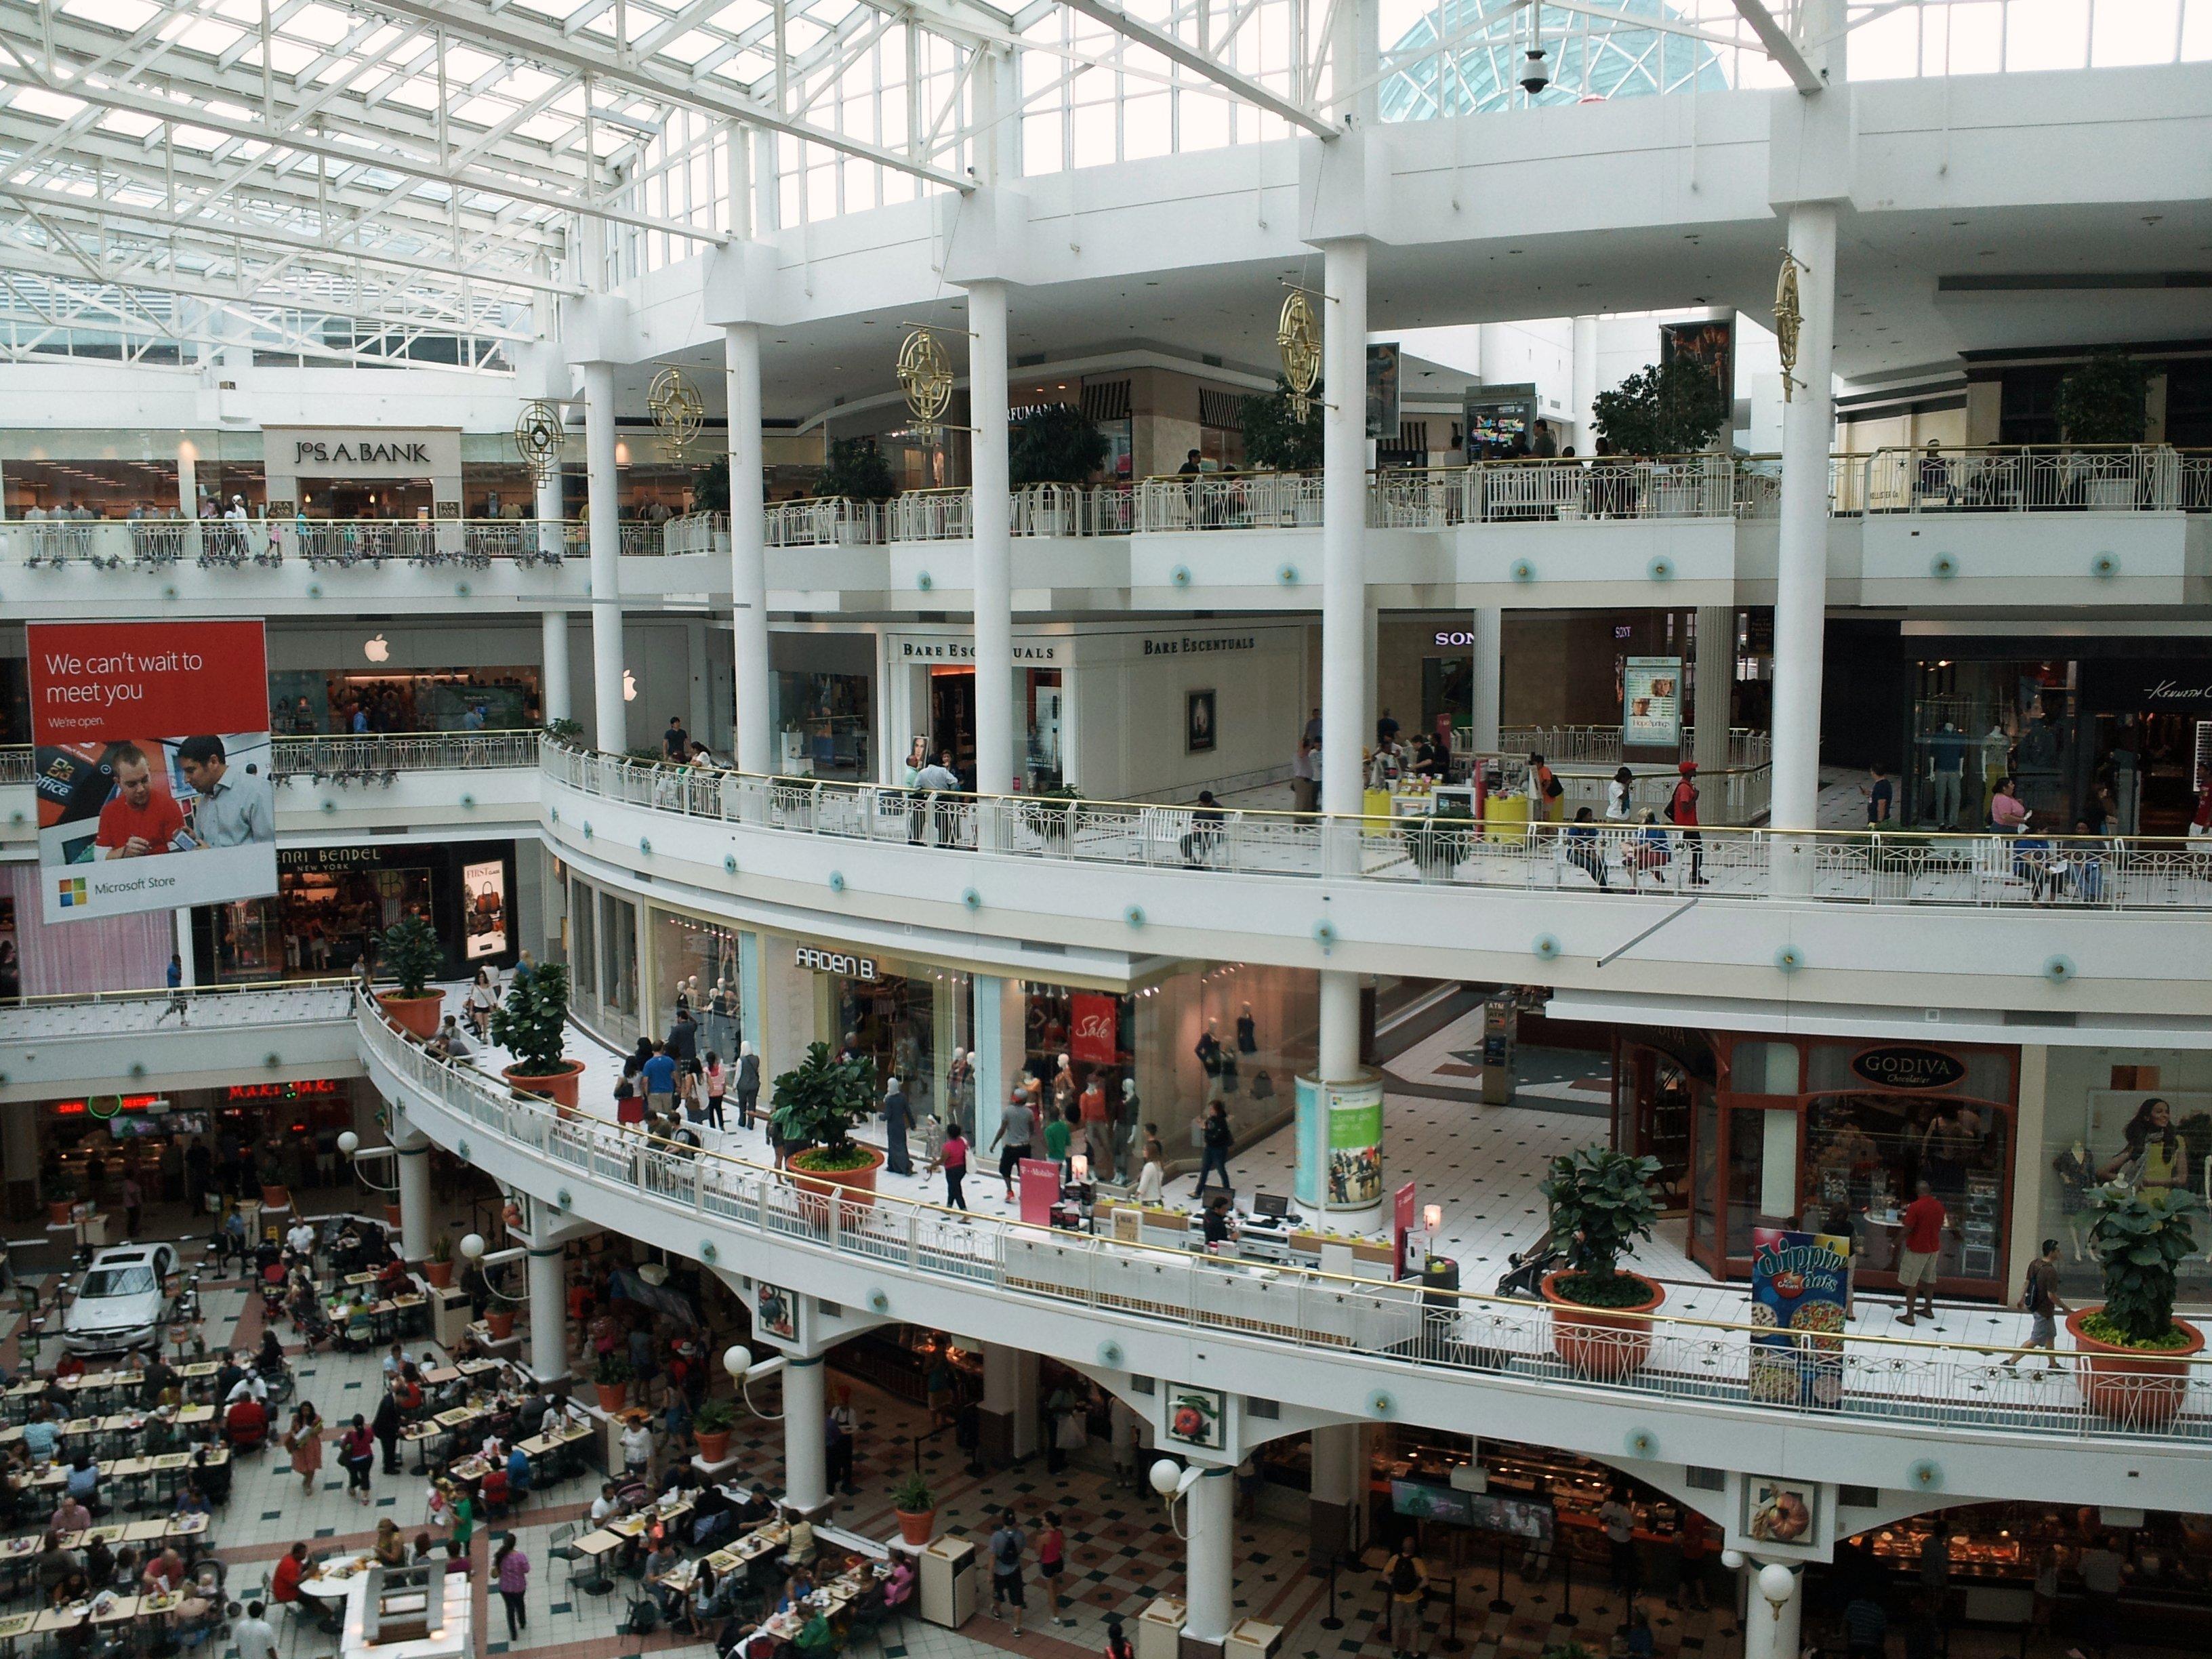 Pentagon Fashion Center Stores